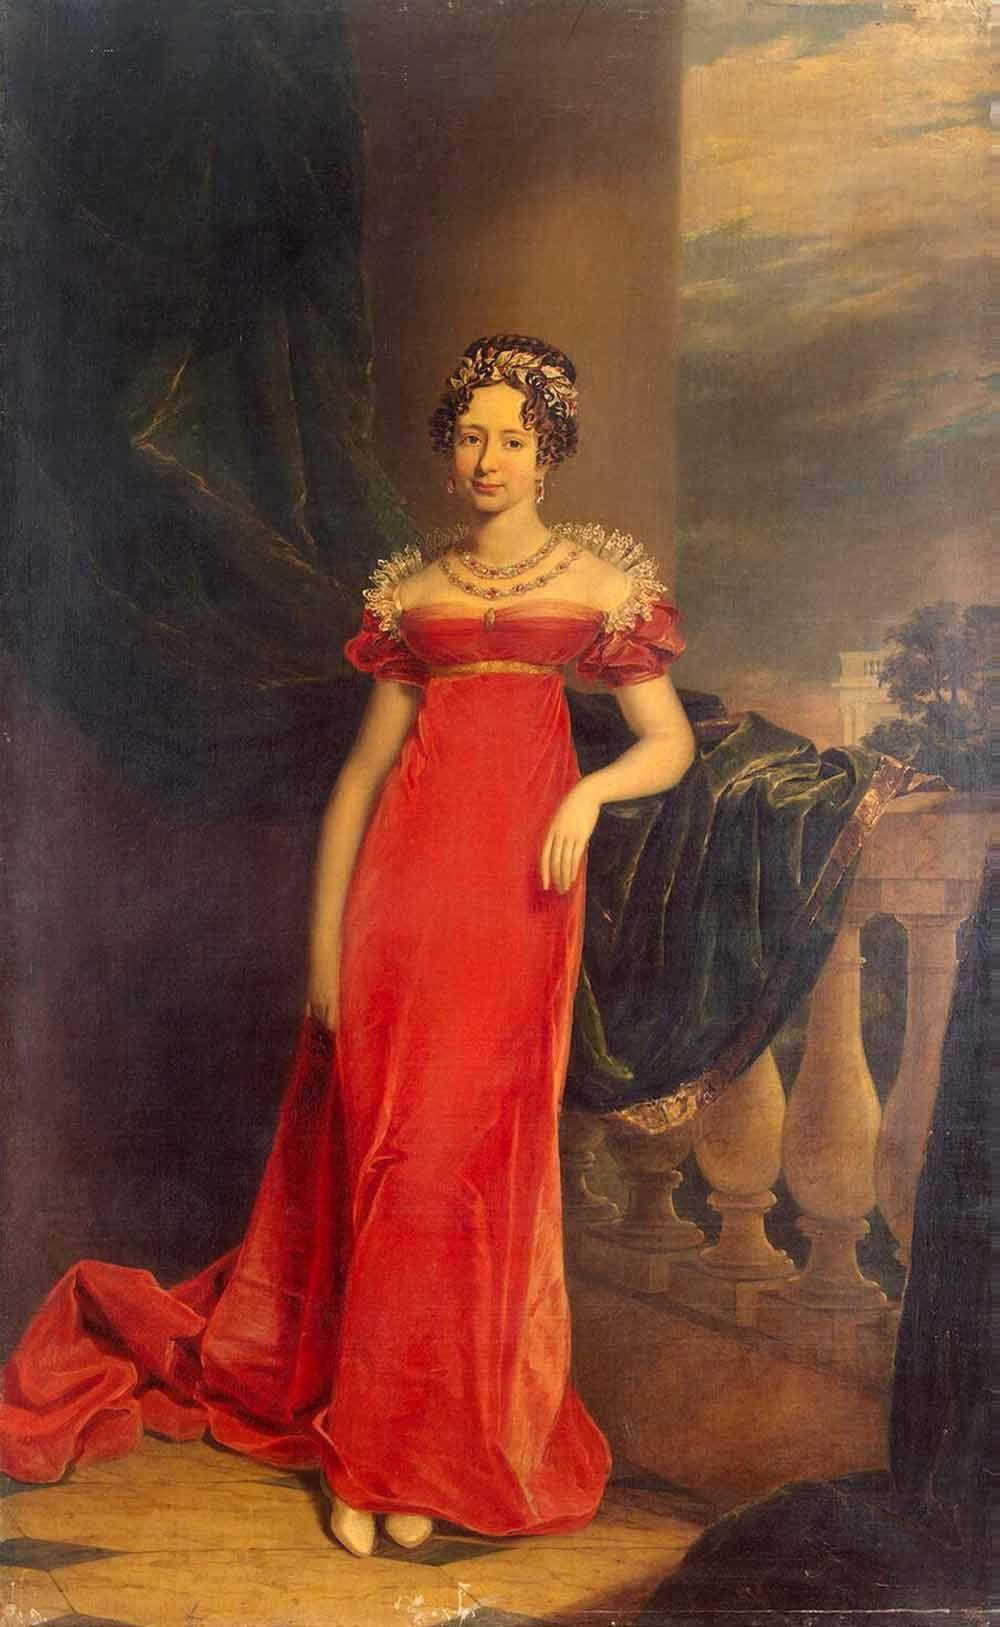 Portrait of Grand Duchess Maria Pavlovna by George Dawe, RA (British, 1781-